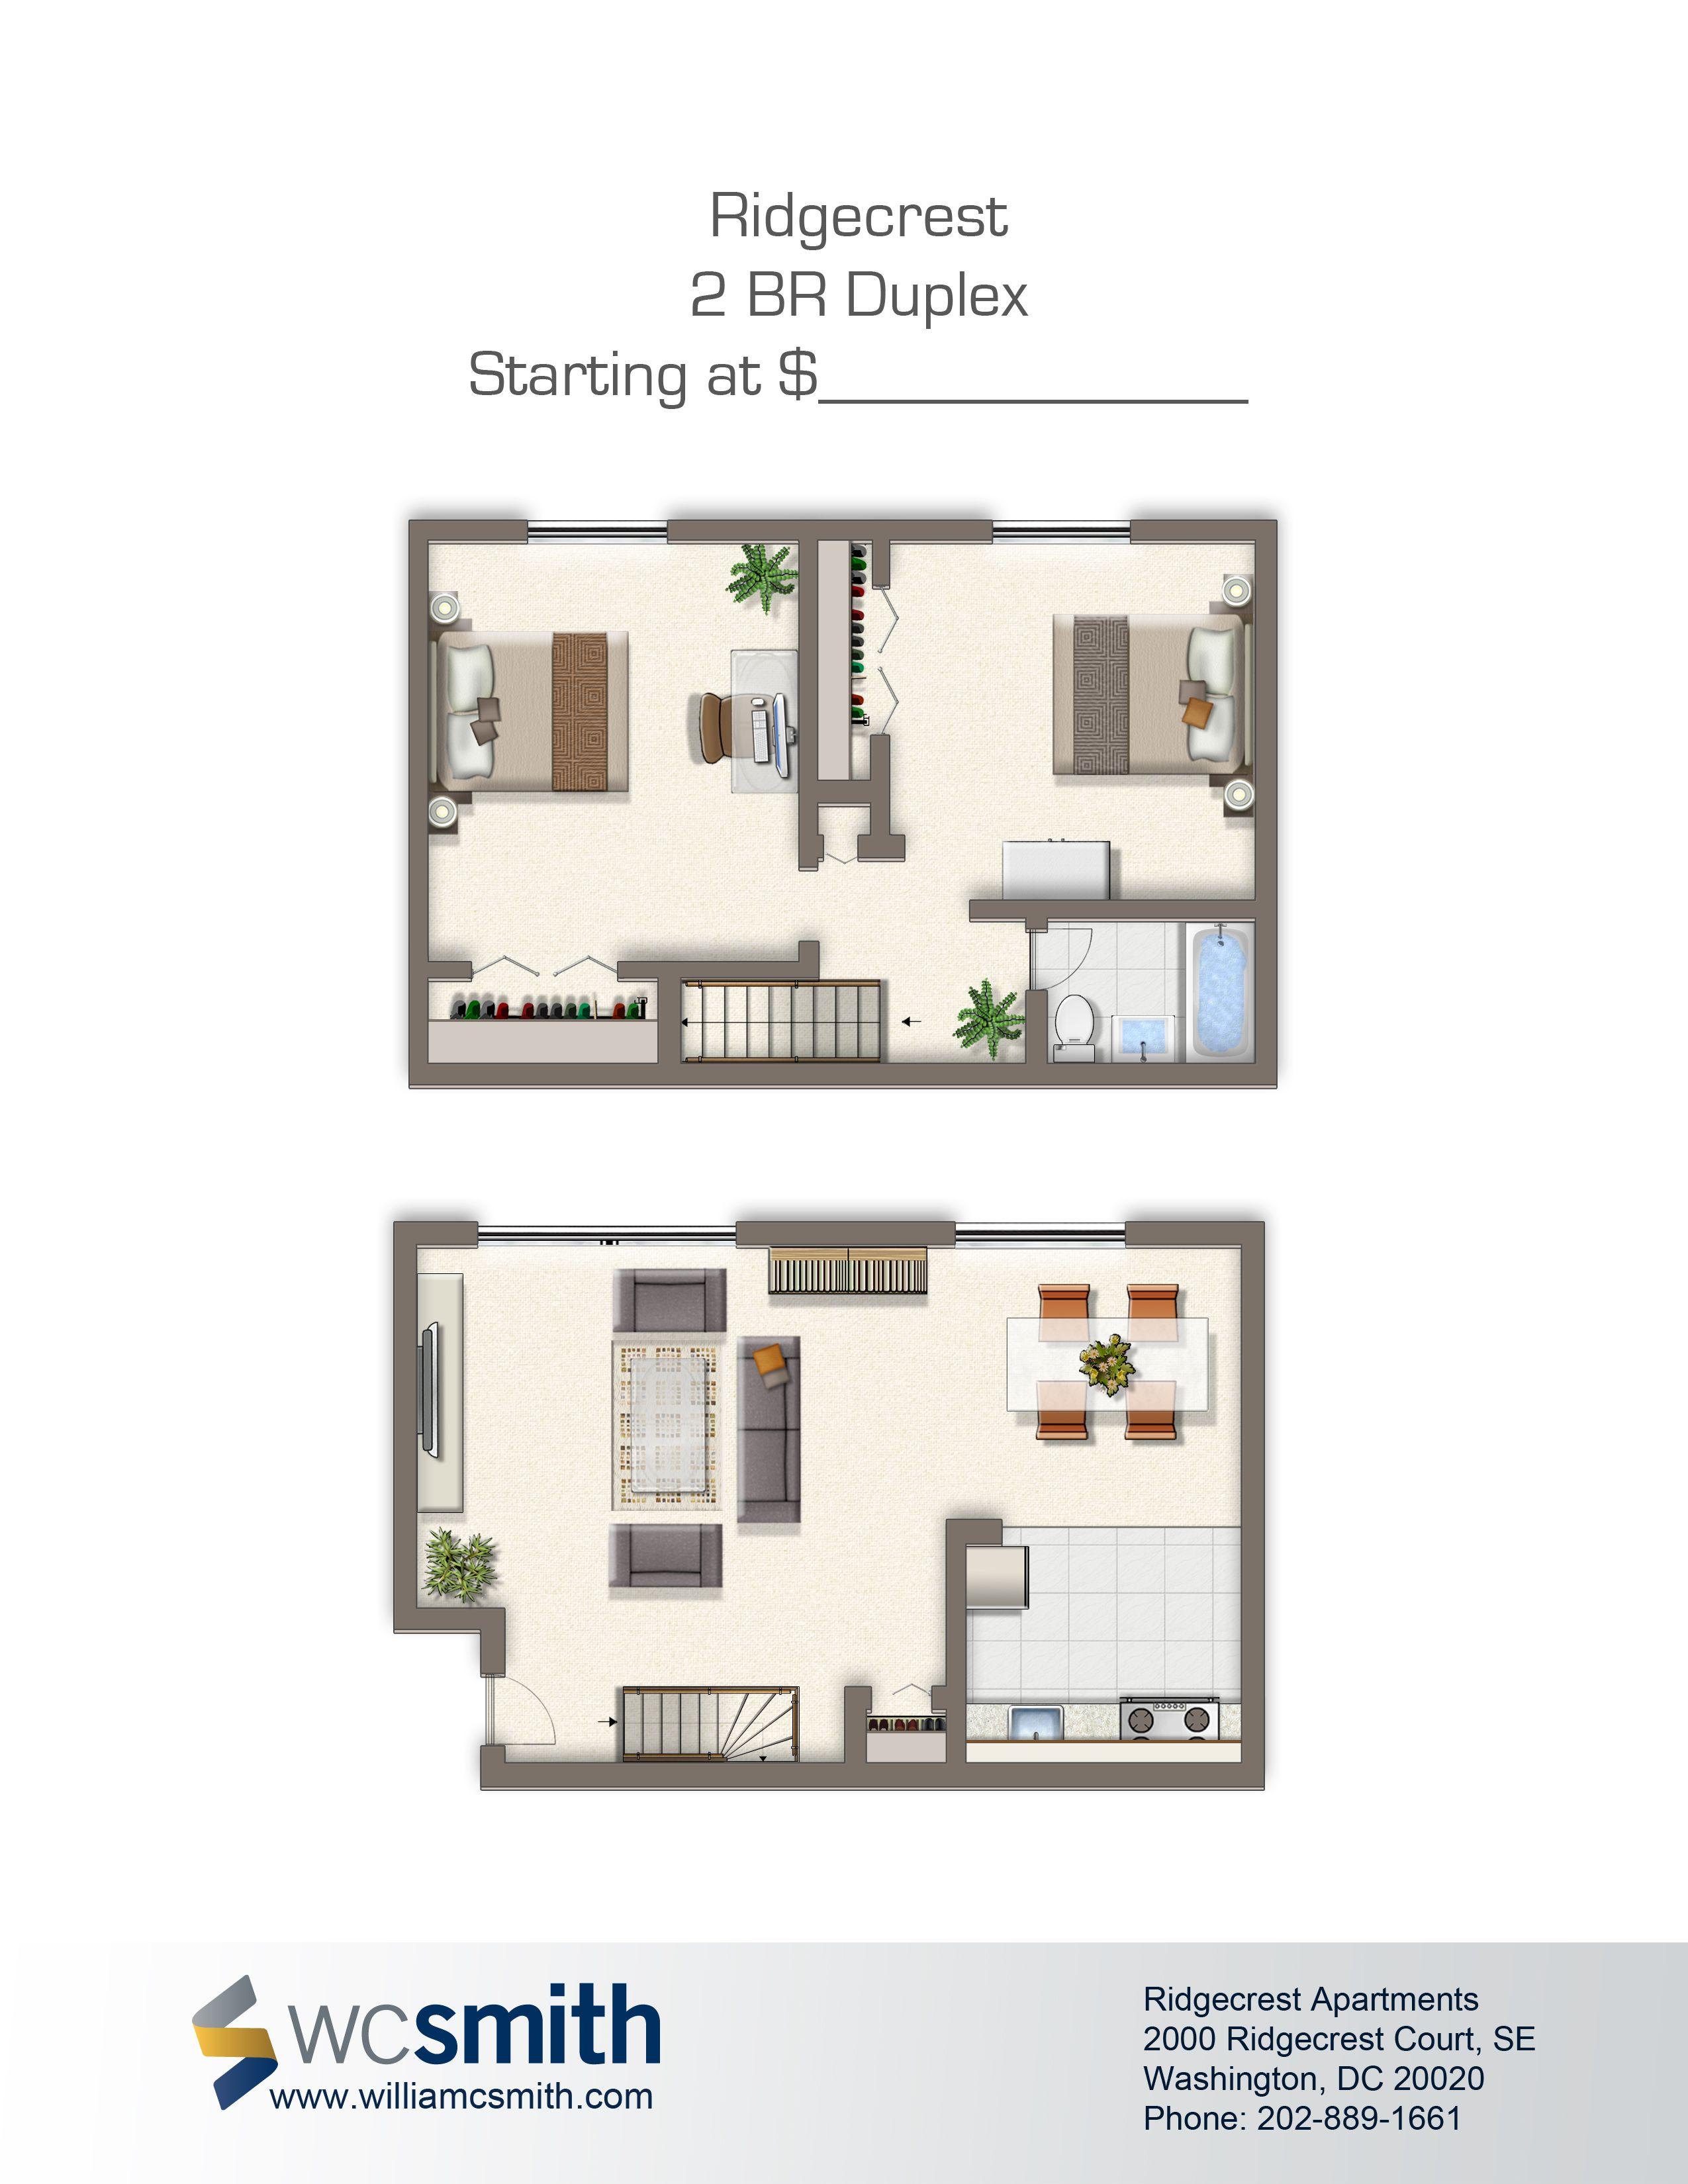 Ridgecrest Apartments Duplex floor plans, Apartment